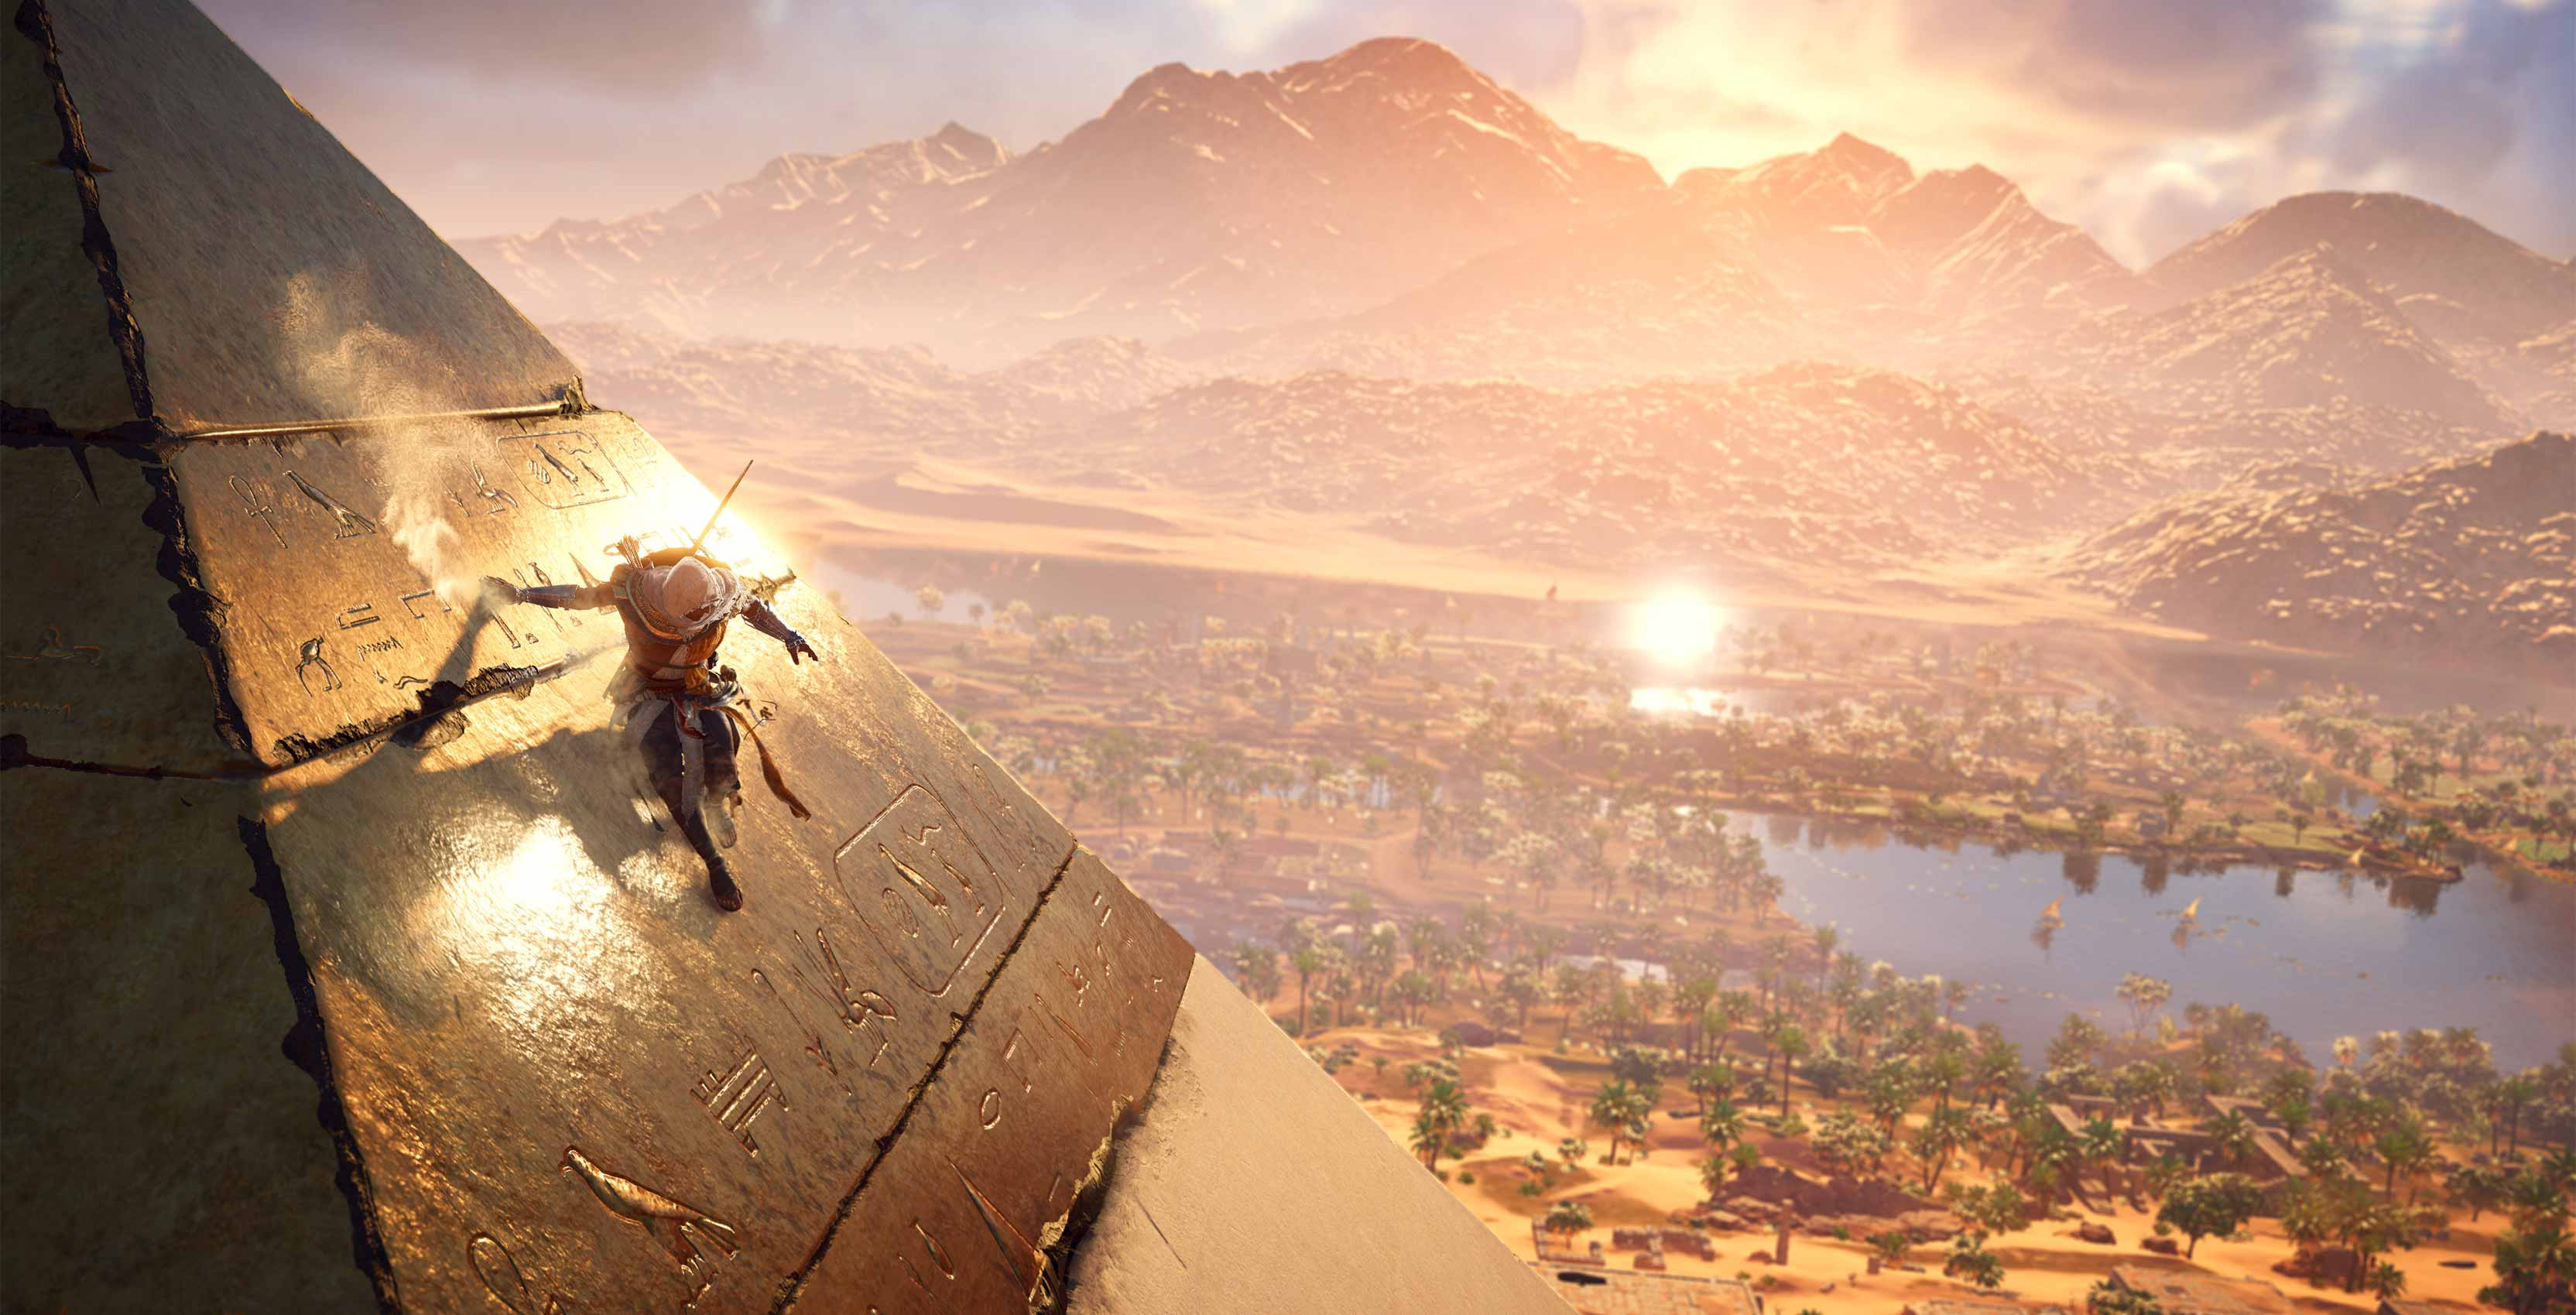 Ubisoft Montreal announces ancient Egypt set Assassin's Creed: Origins